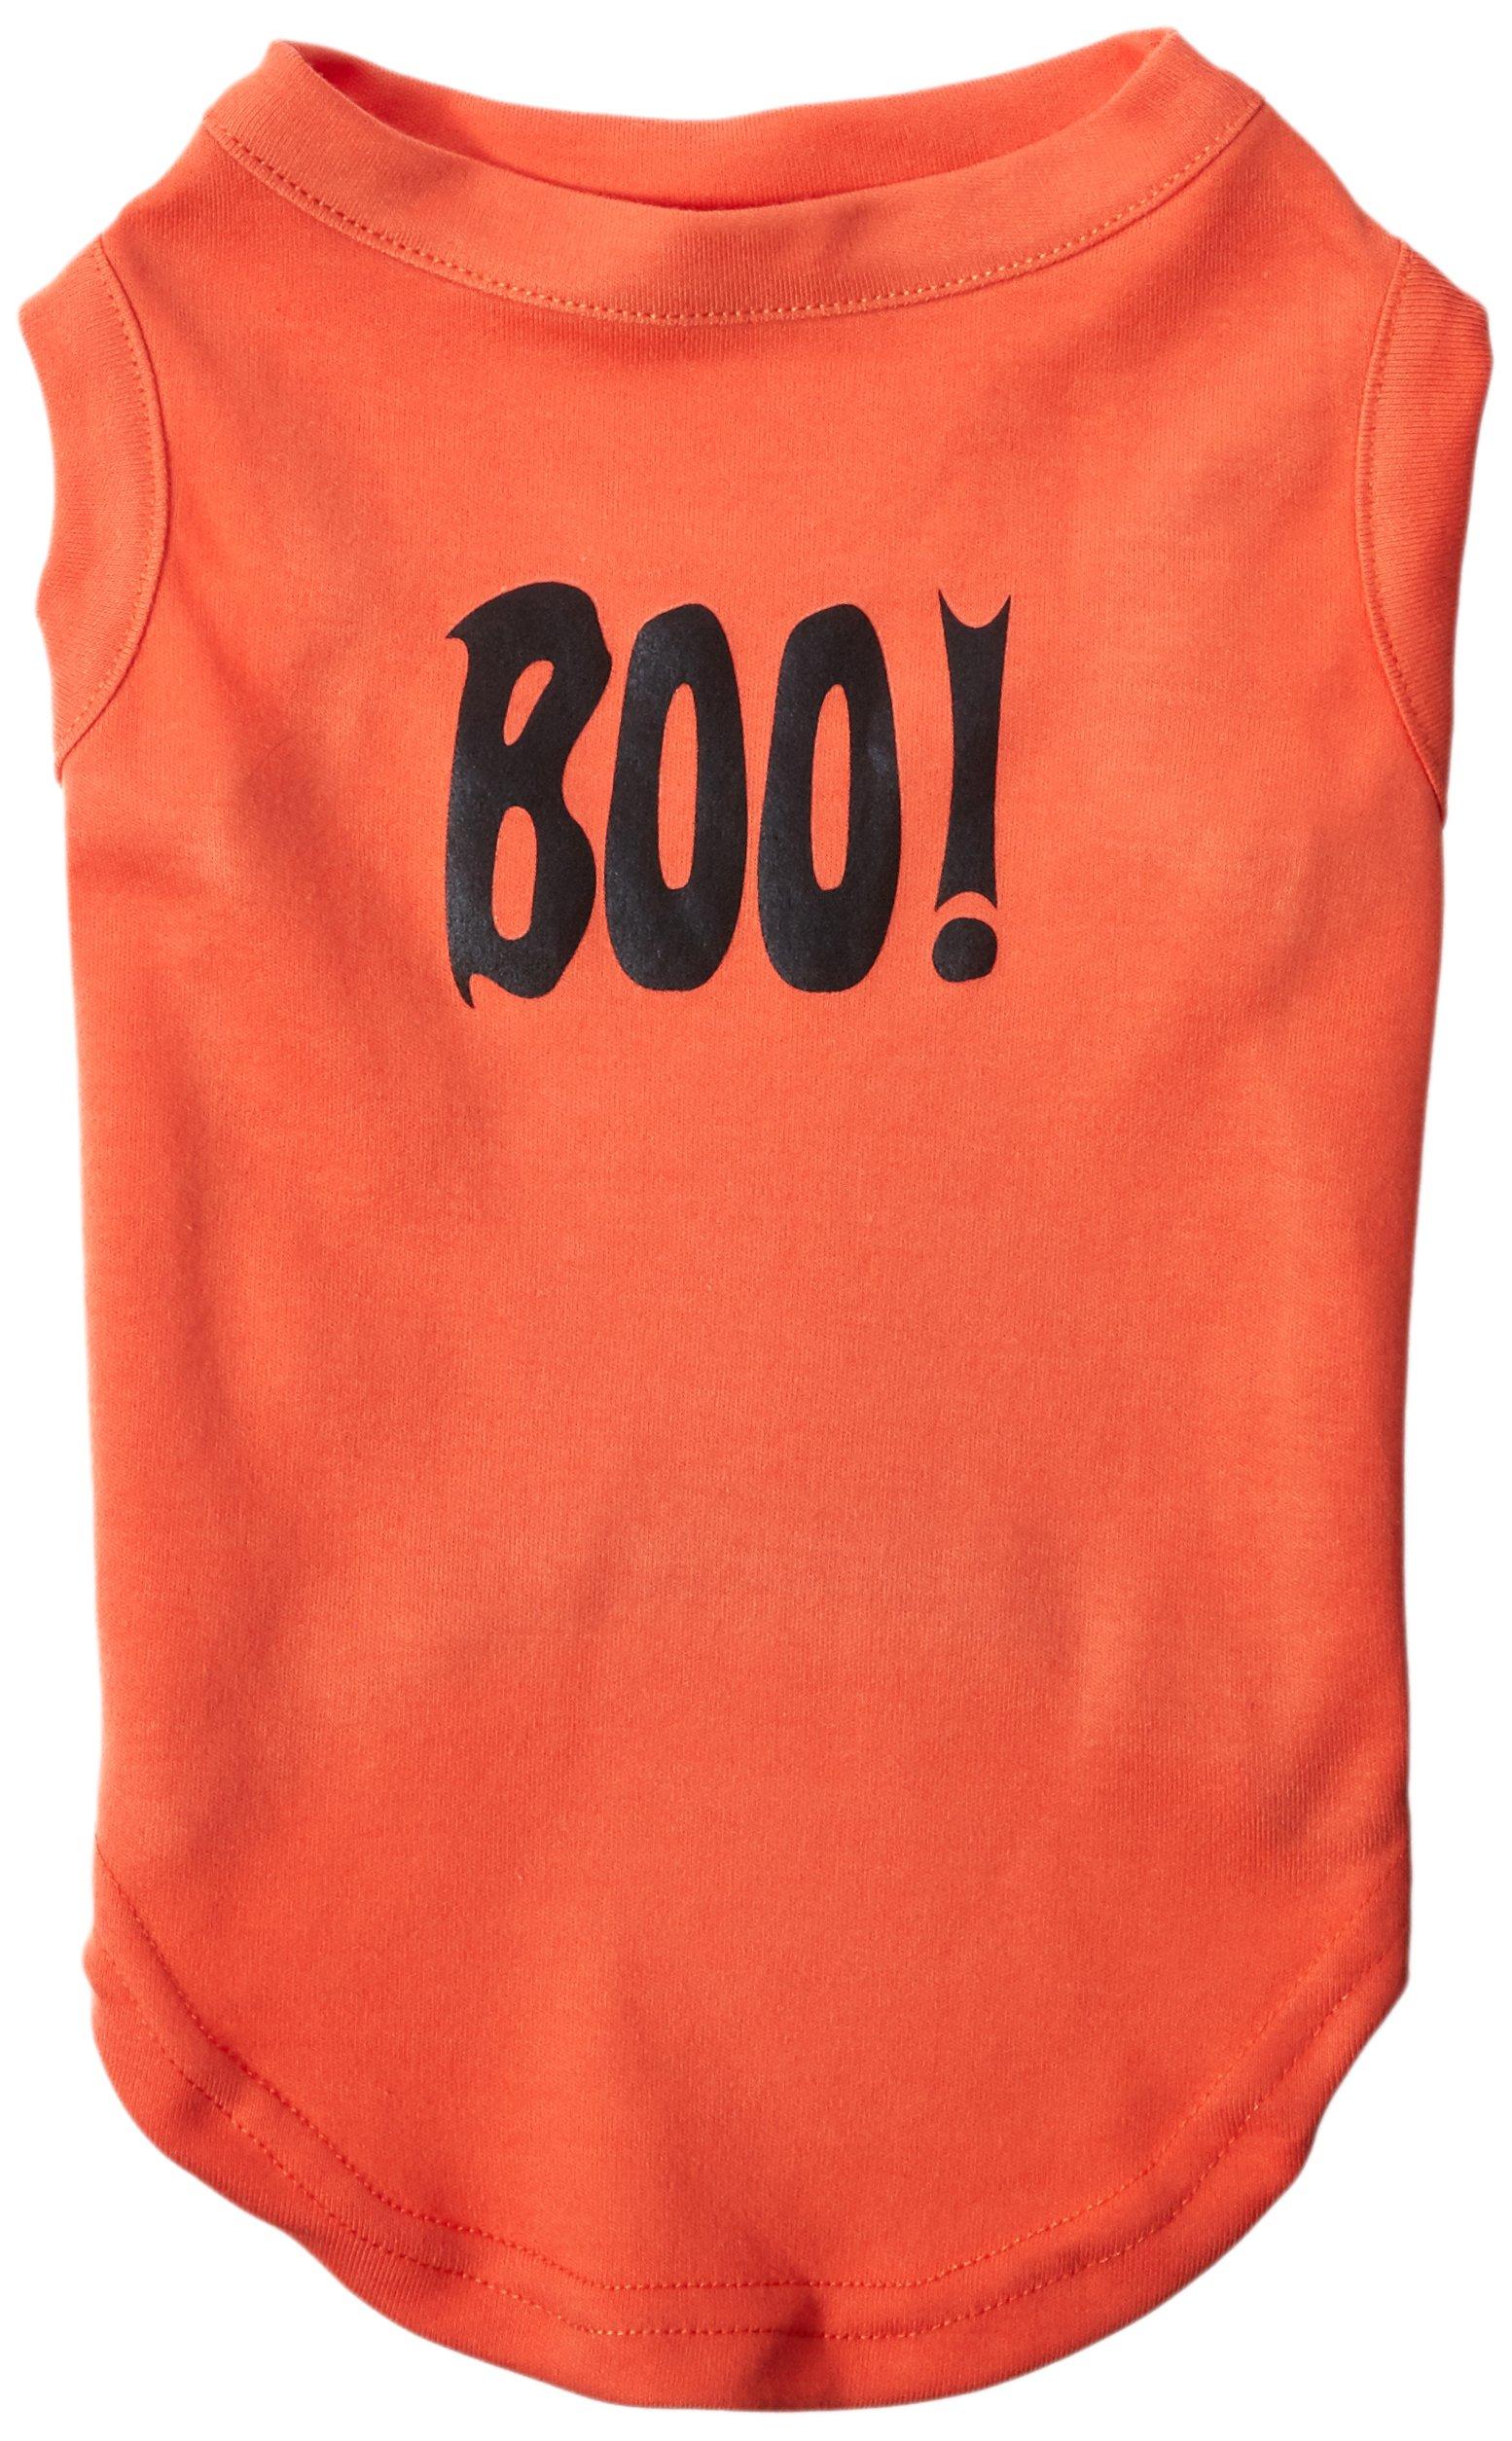 Mirage Pet Products Boo! Screen Print Shirts Orange Lg (14)